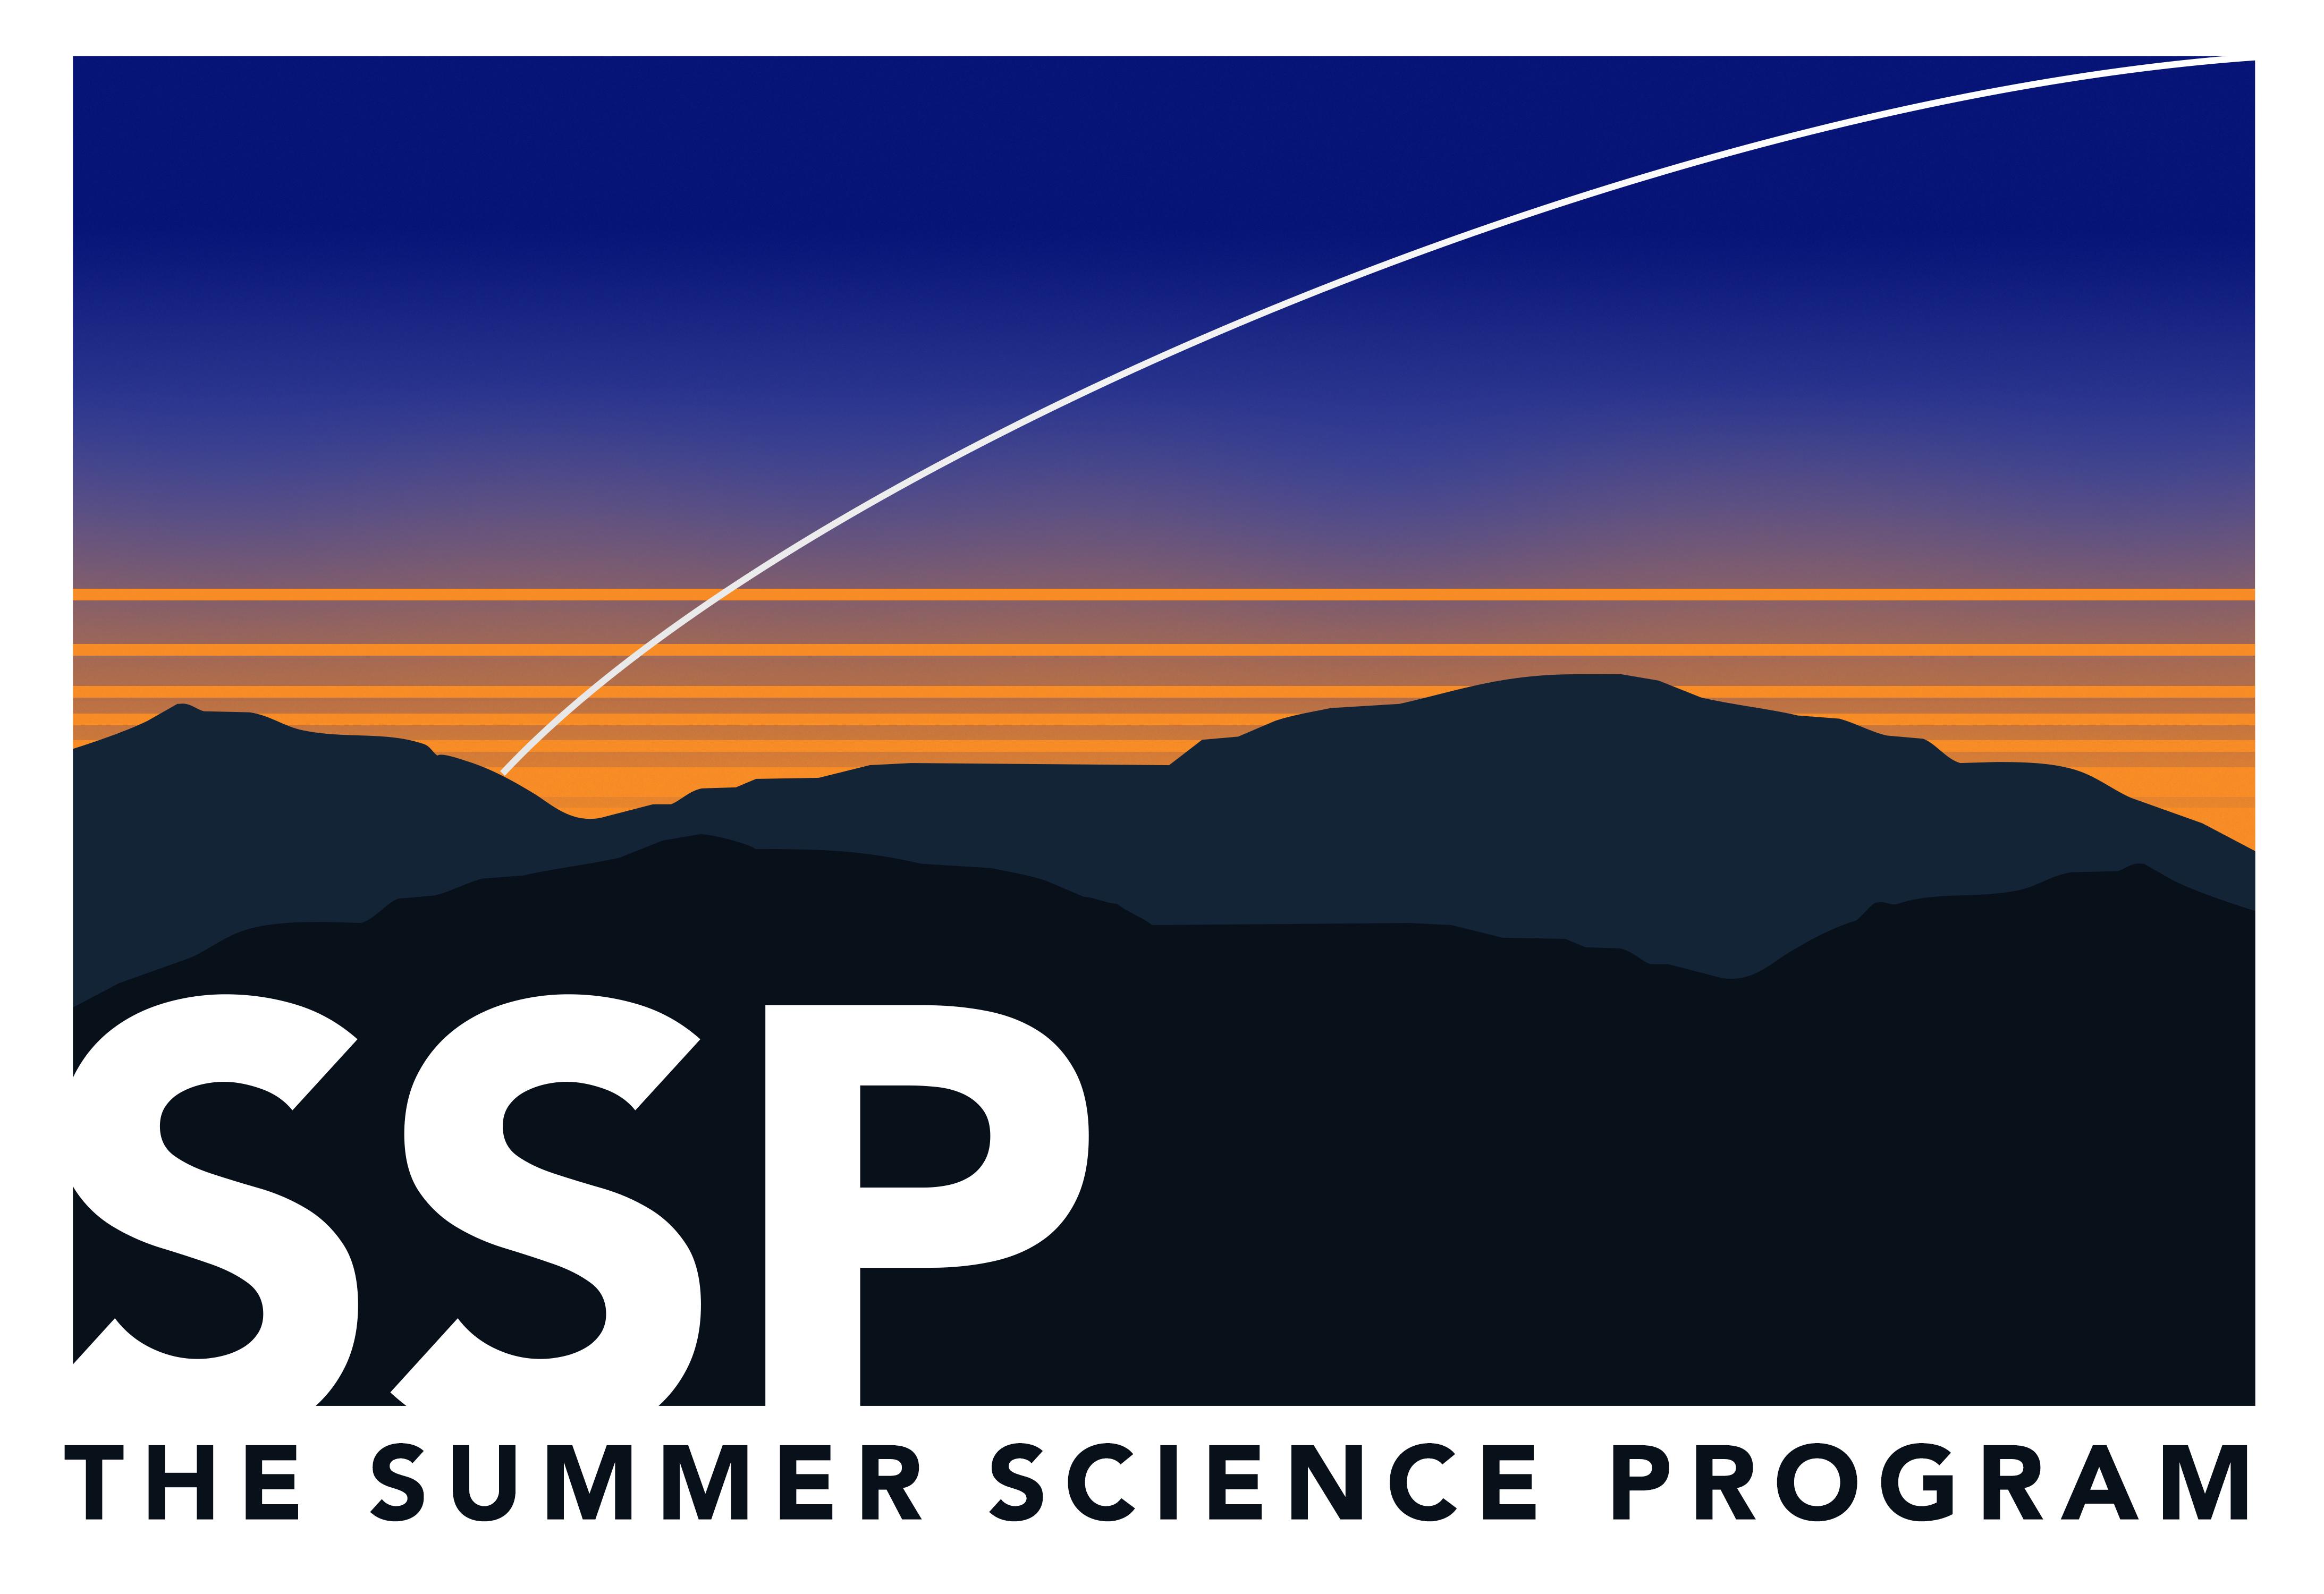 The Summer Science Program in Biochemistry at Indiana Univ